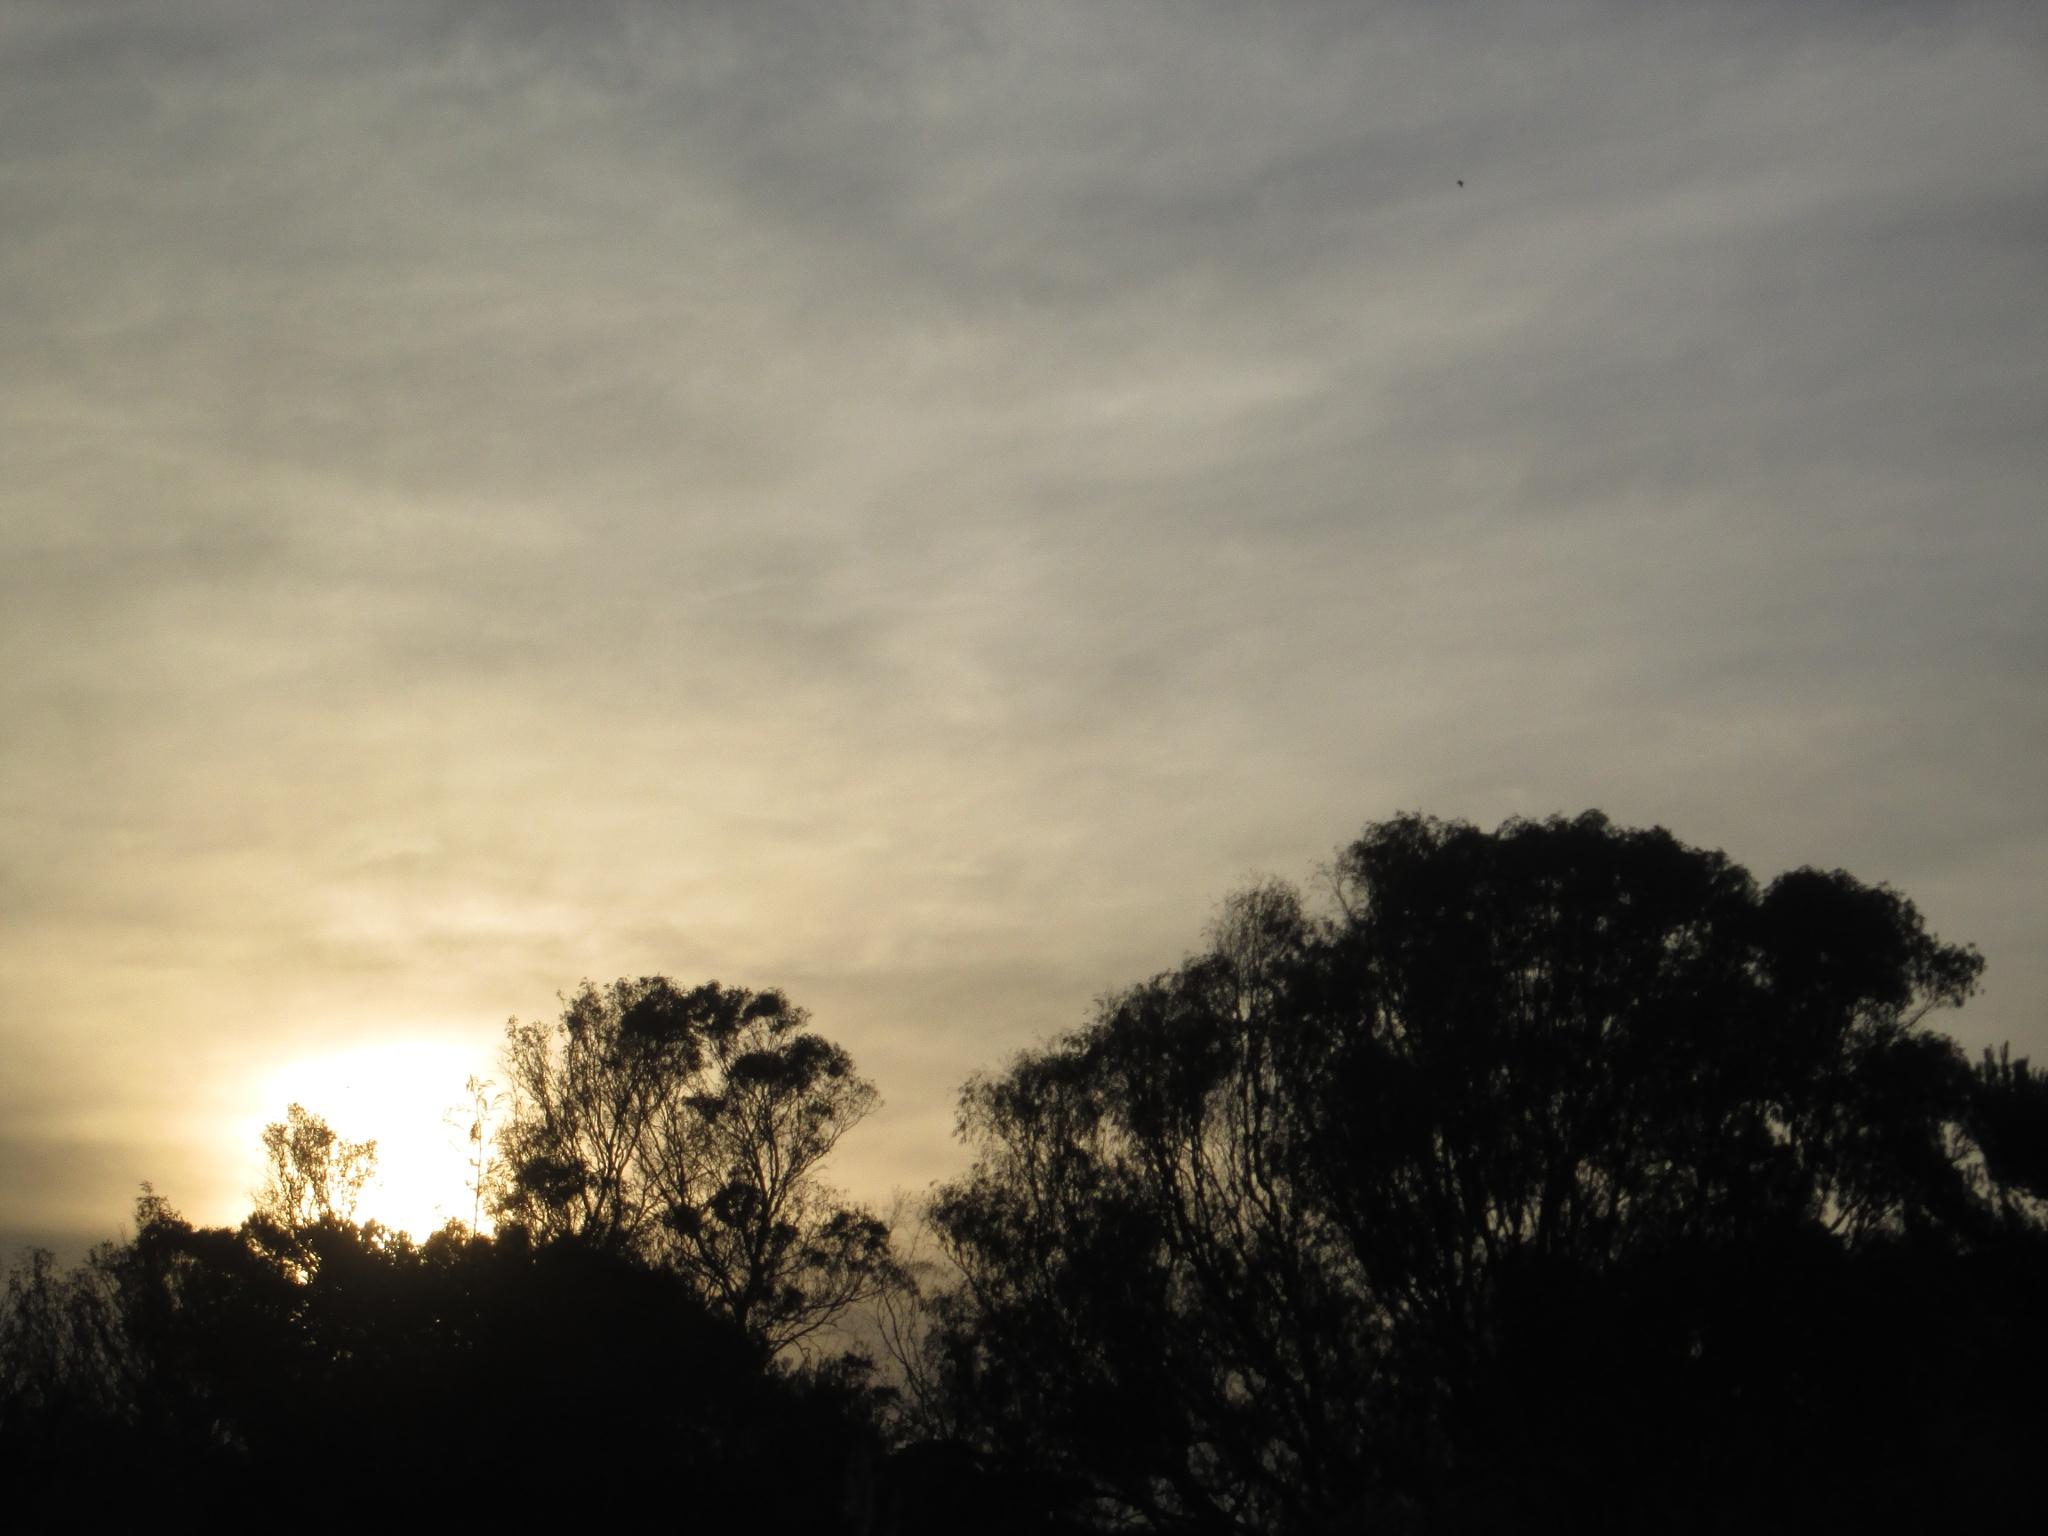 Evening by michaelwrescz